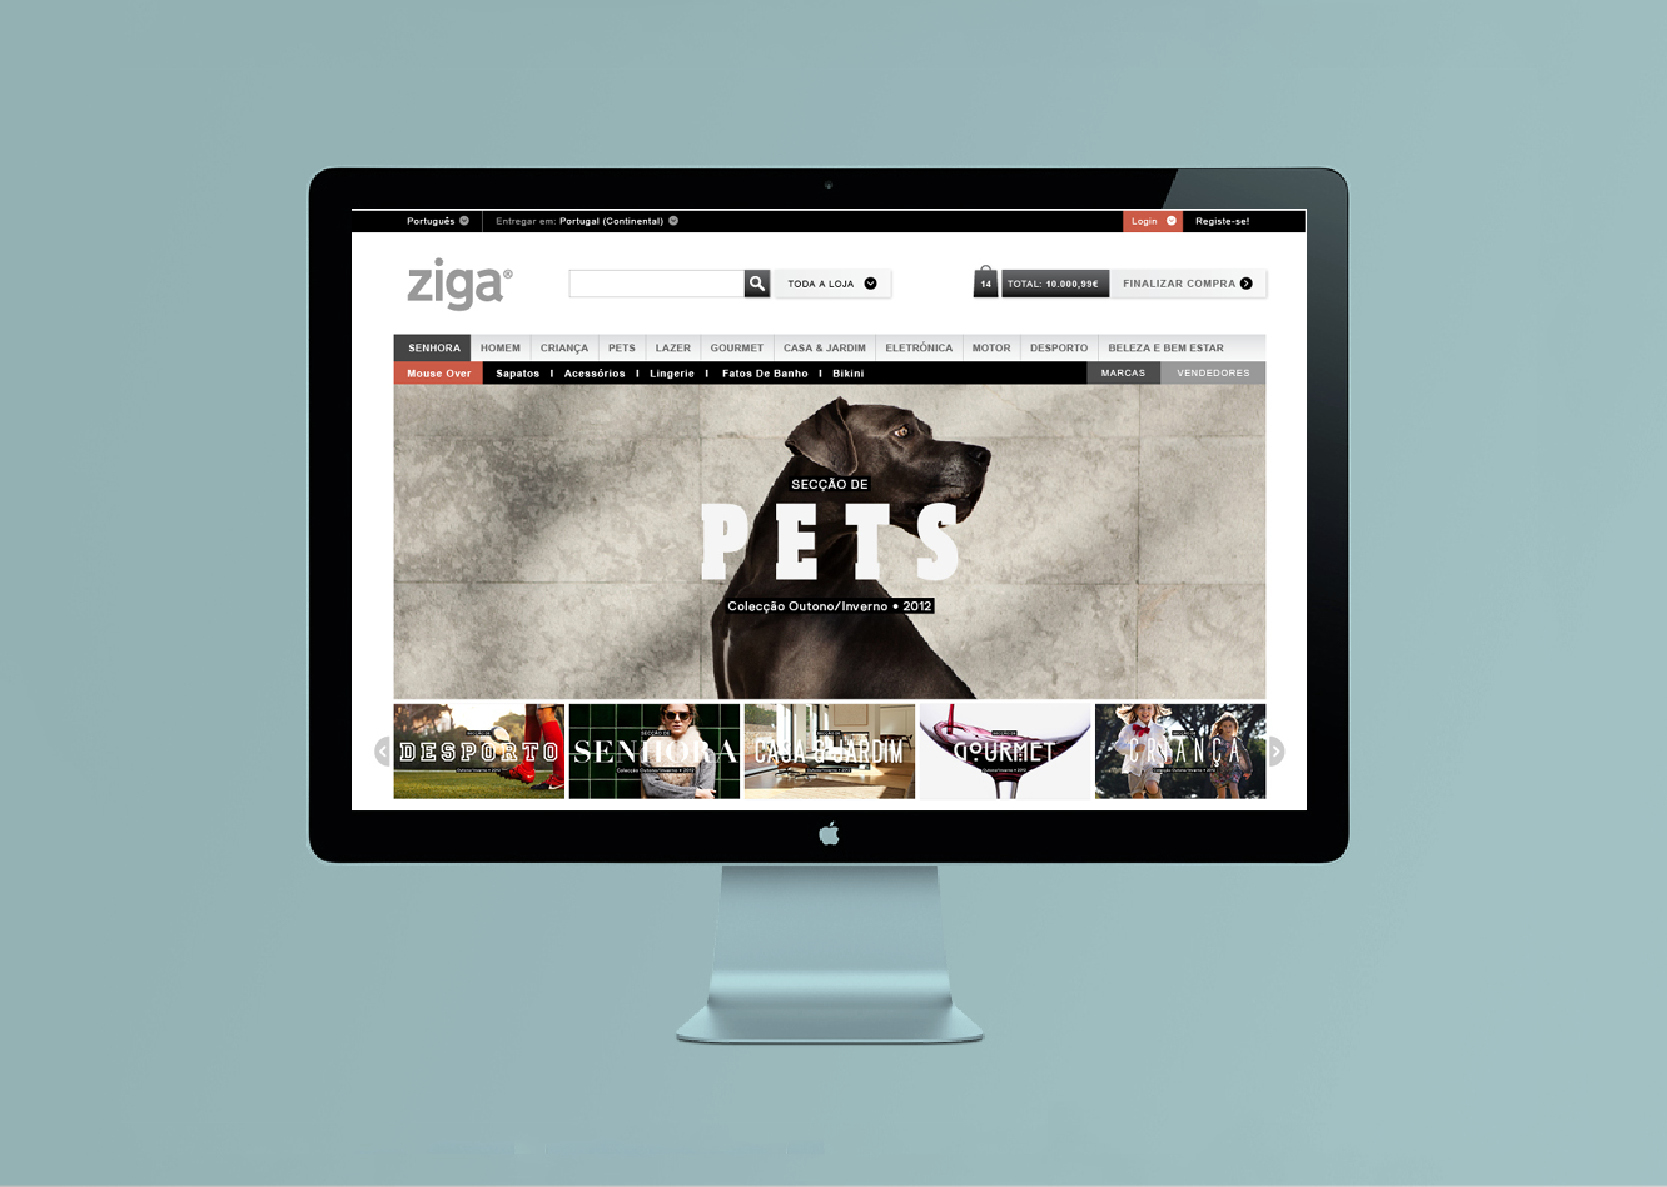 ziga-site3.jpg